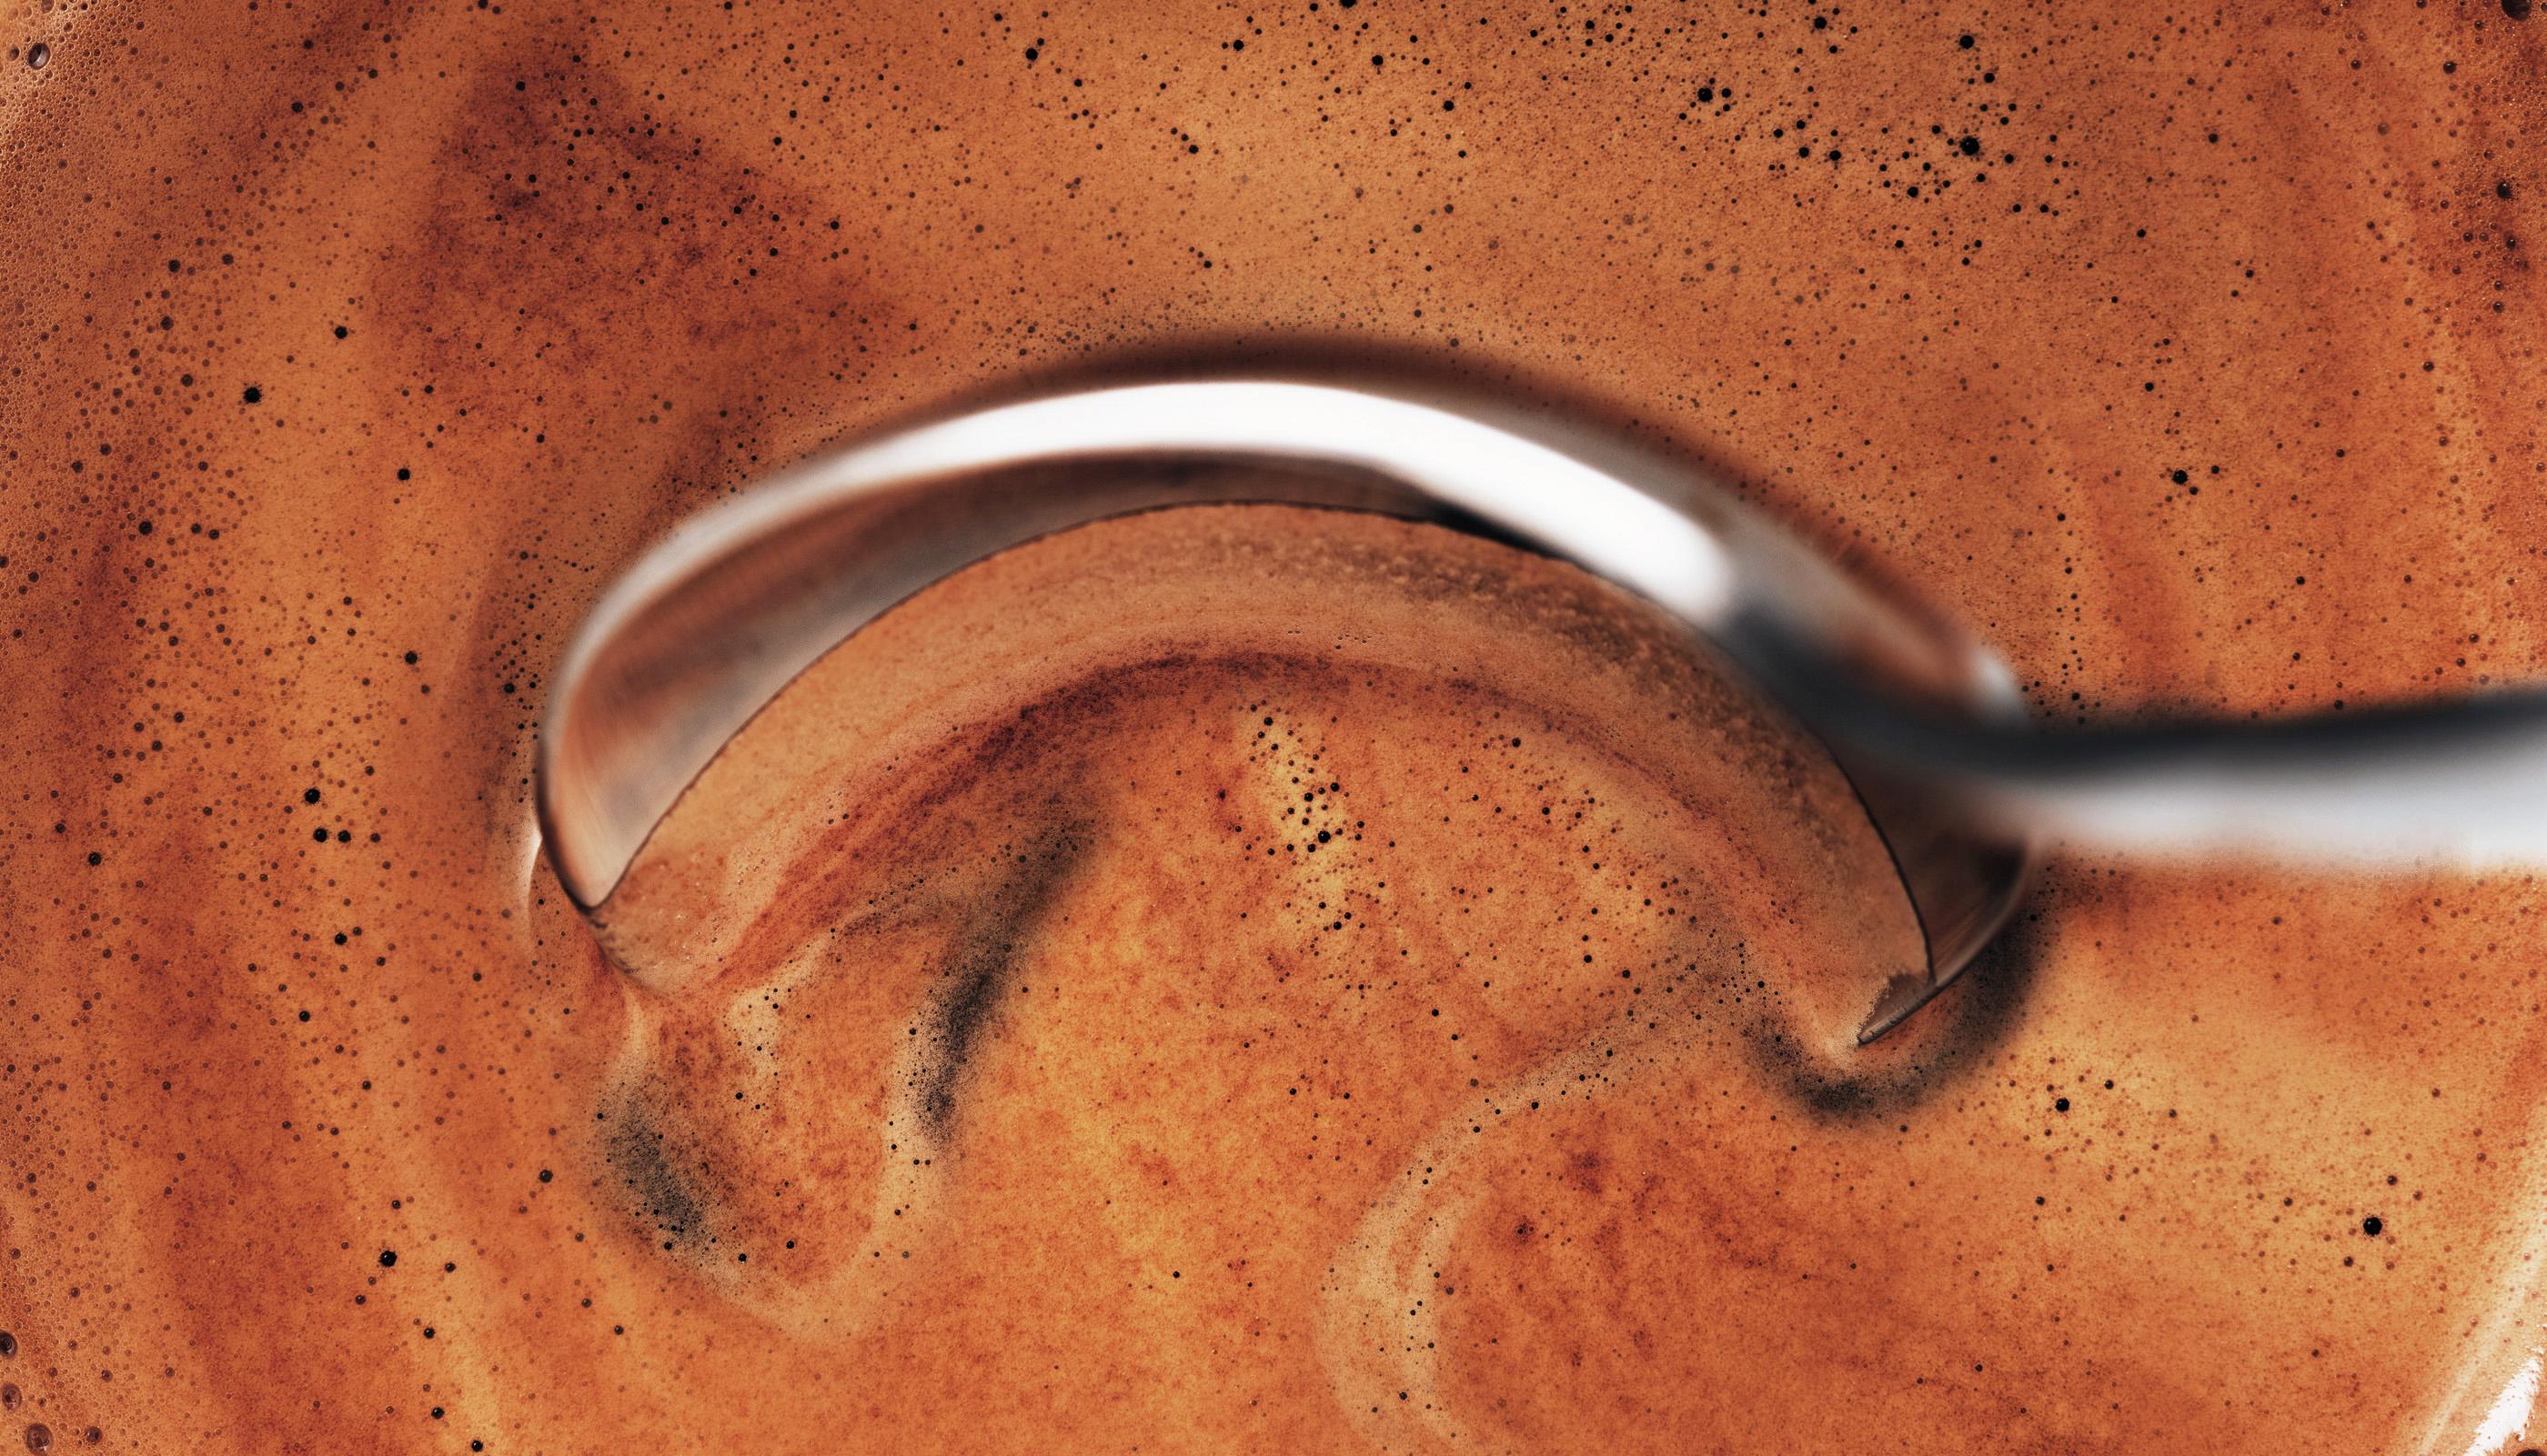 Chuyên mục Hóa học cà phê - PrimeCoffee